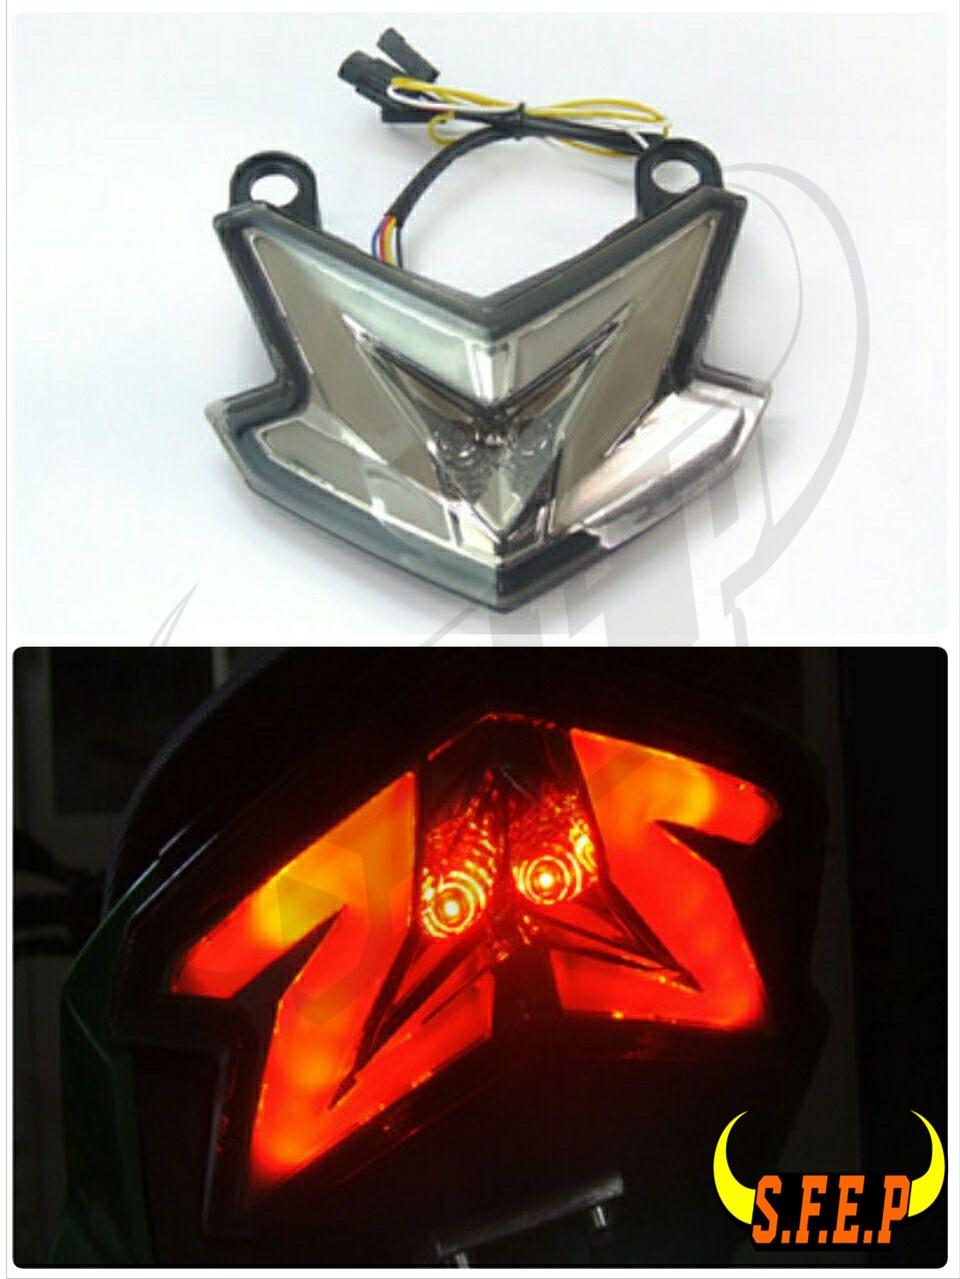 LED Motorcycle Rear Integrated Tail Light Brake Turn Signals Smoke For Kawasaki Z800 ZX6R/636 2013-2016